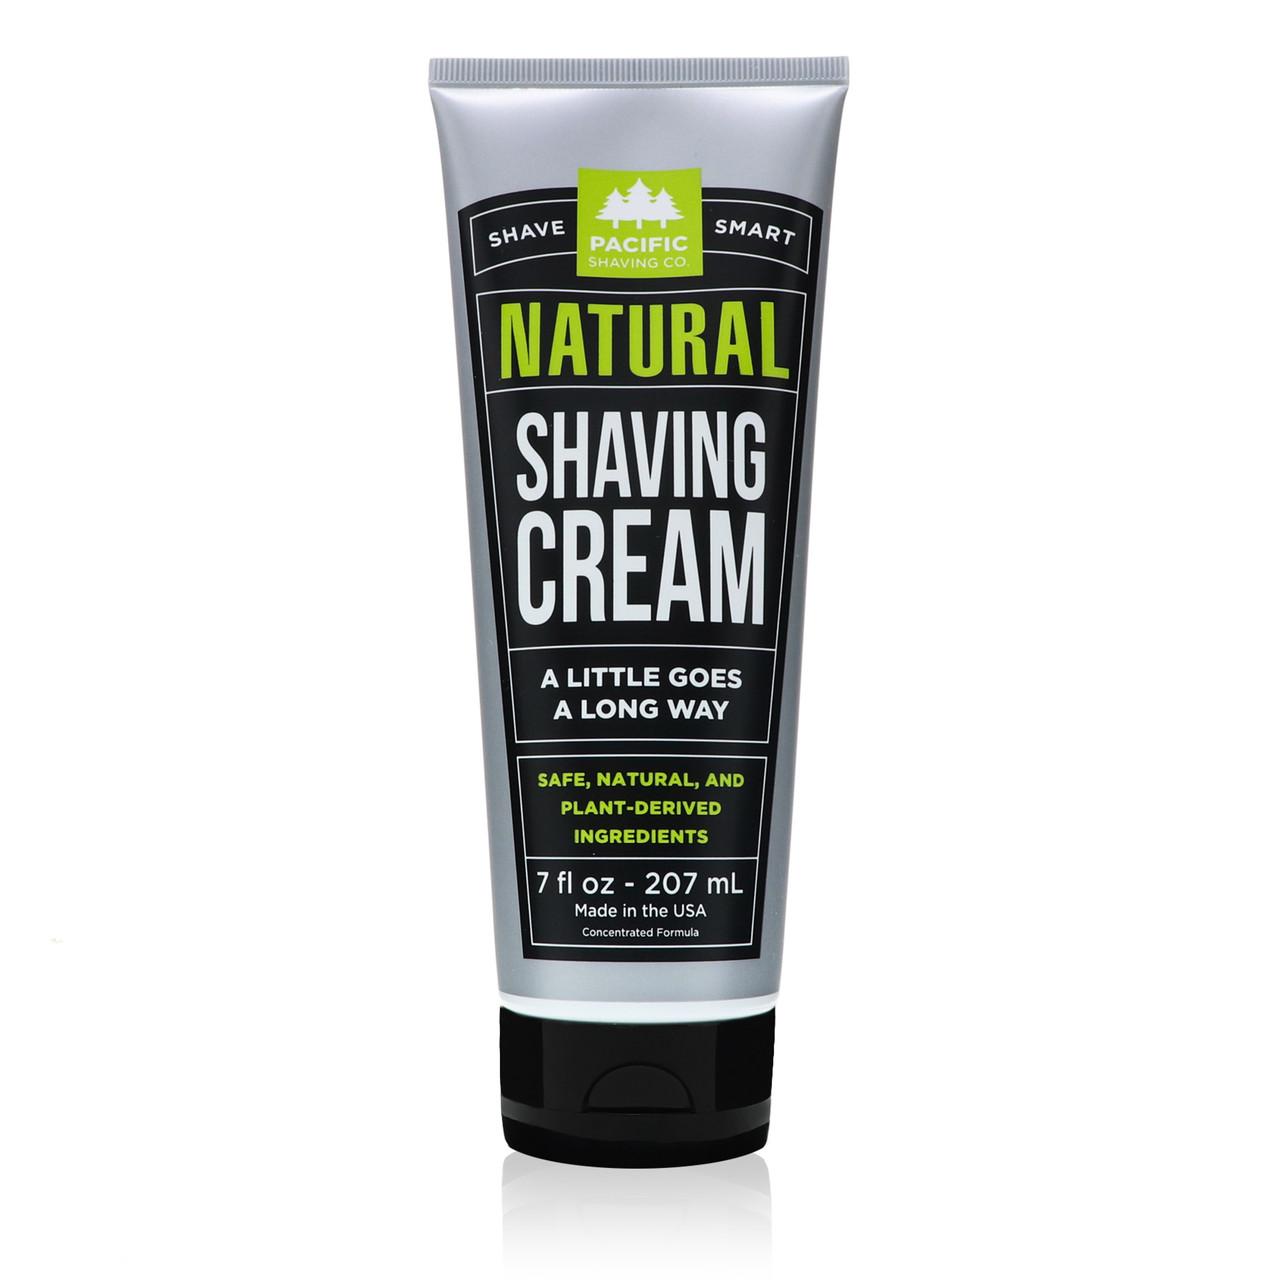 Natural Shaving Cream by Pacific Shaving Company.